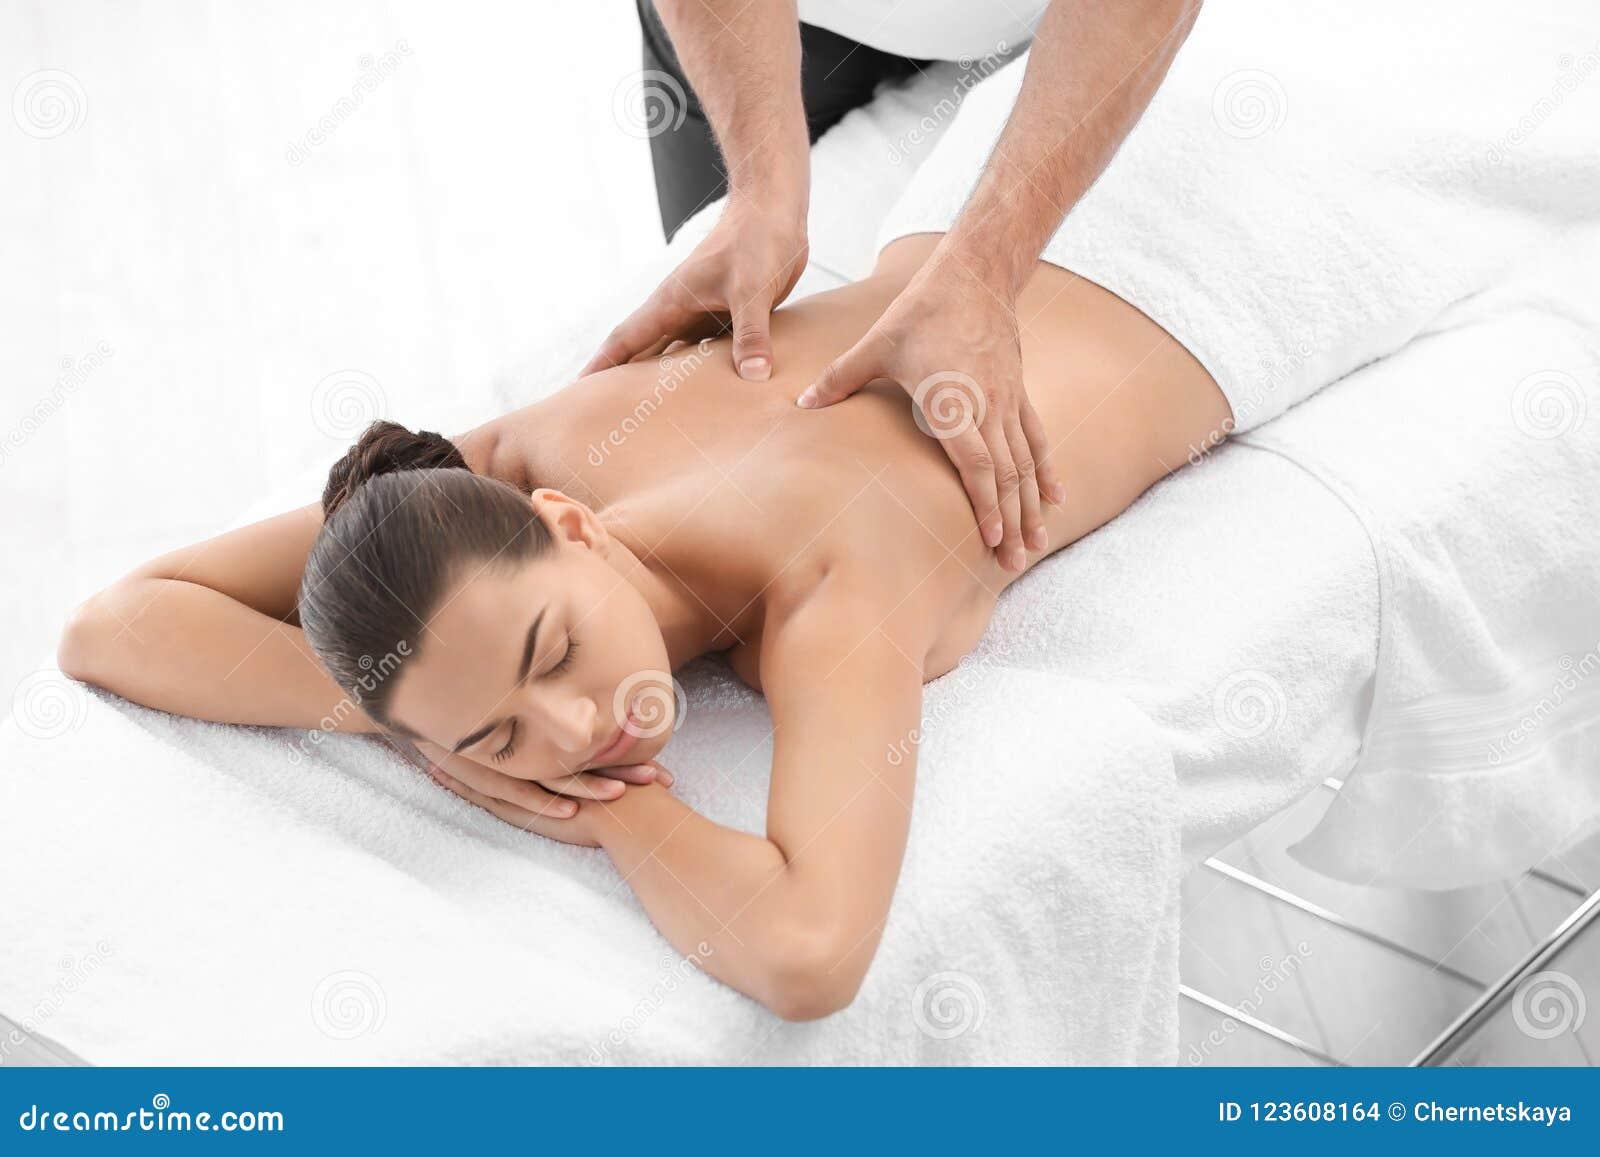 Relaxed woman receiving back massage d